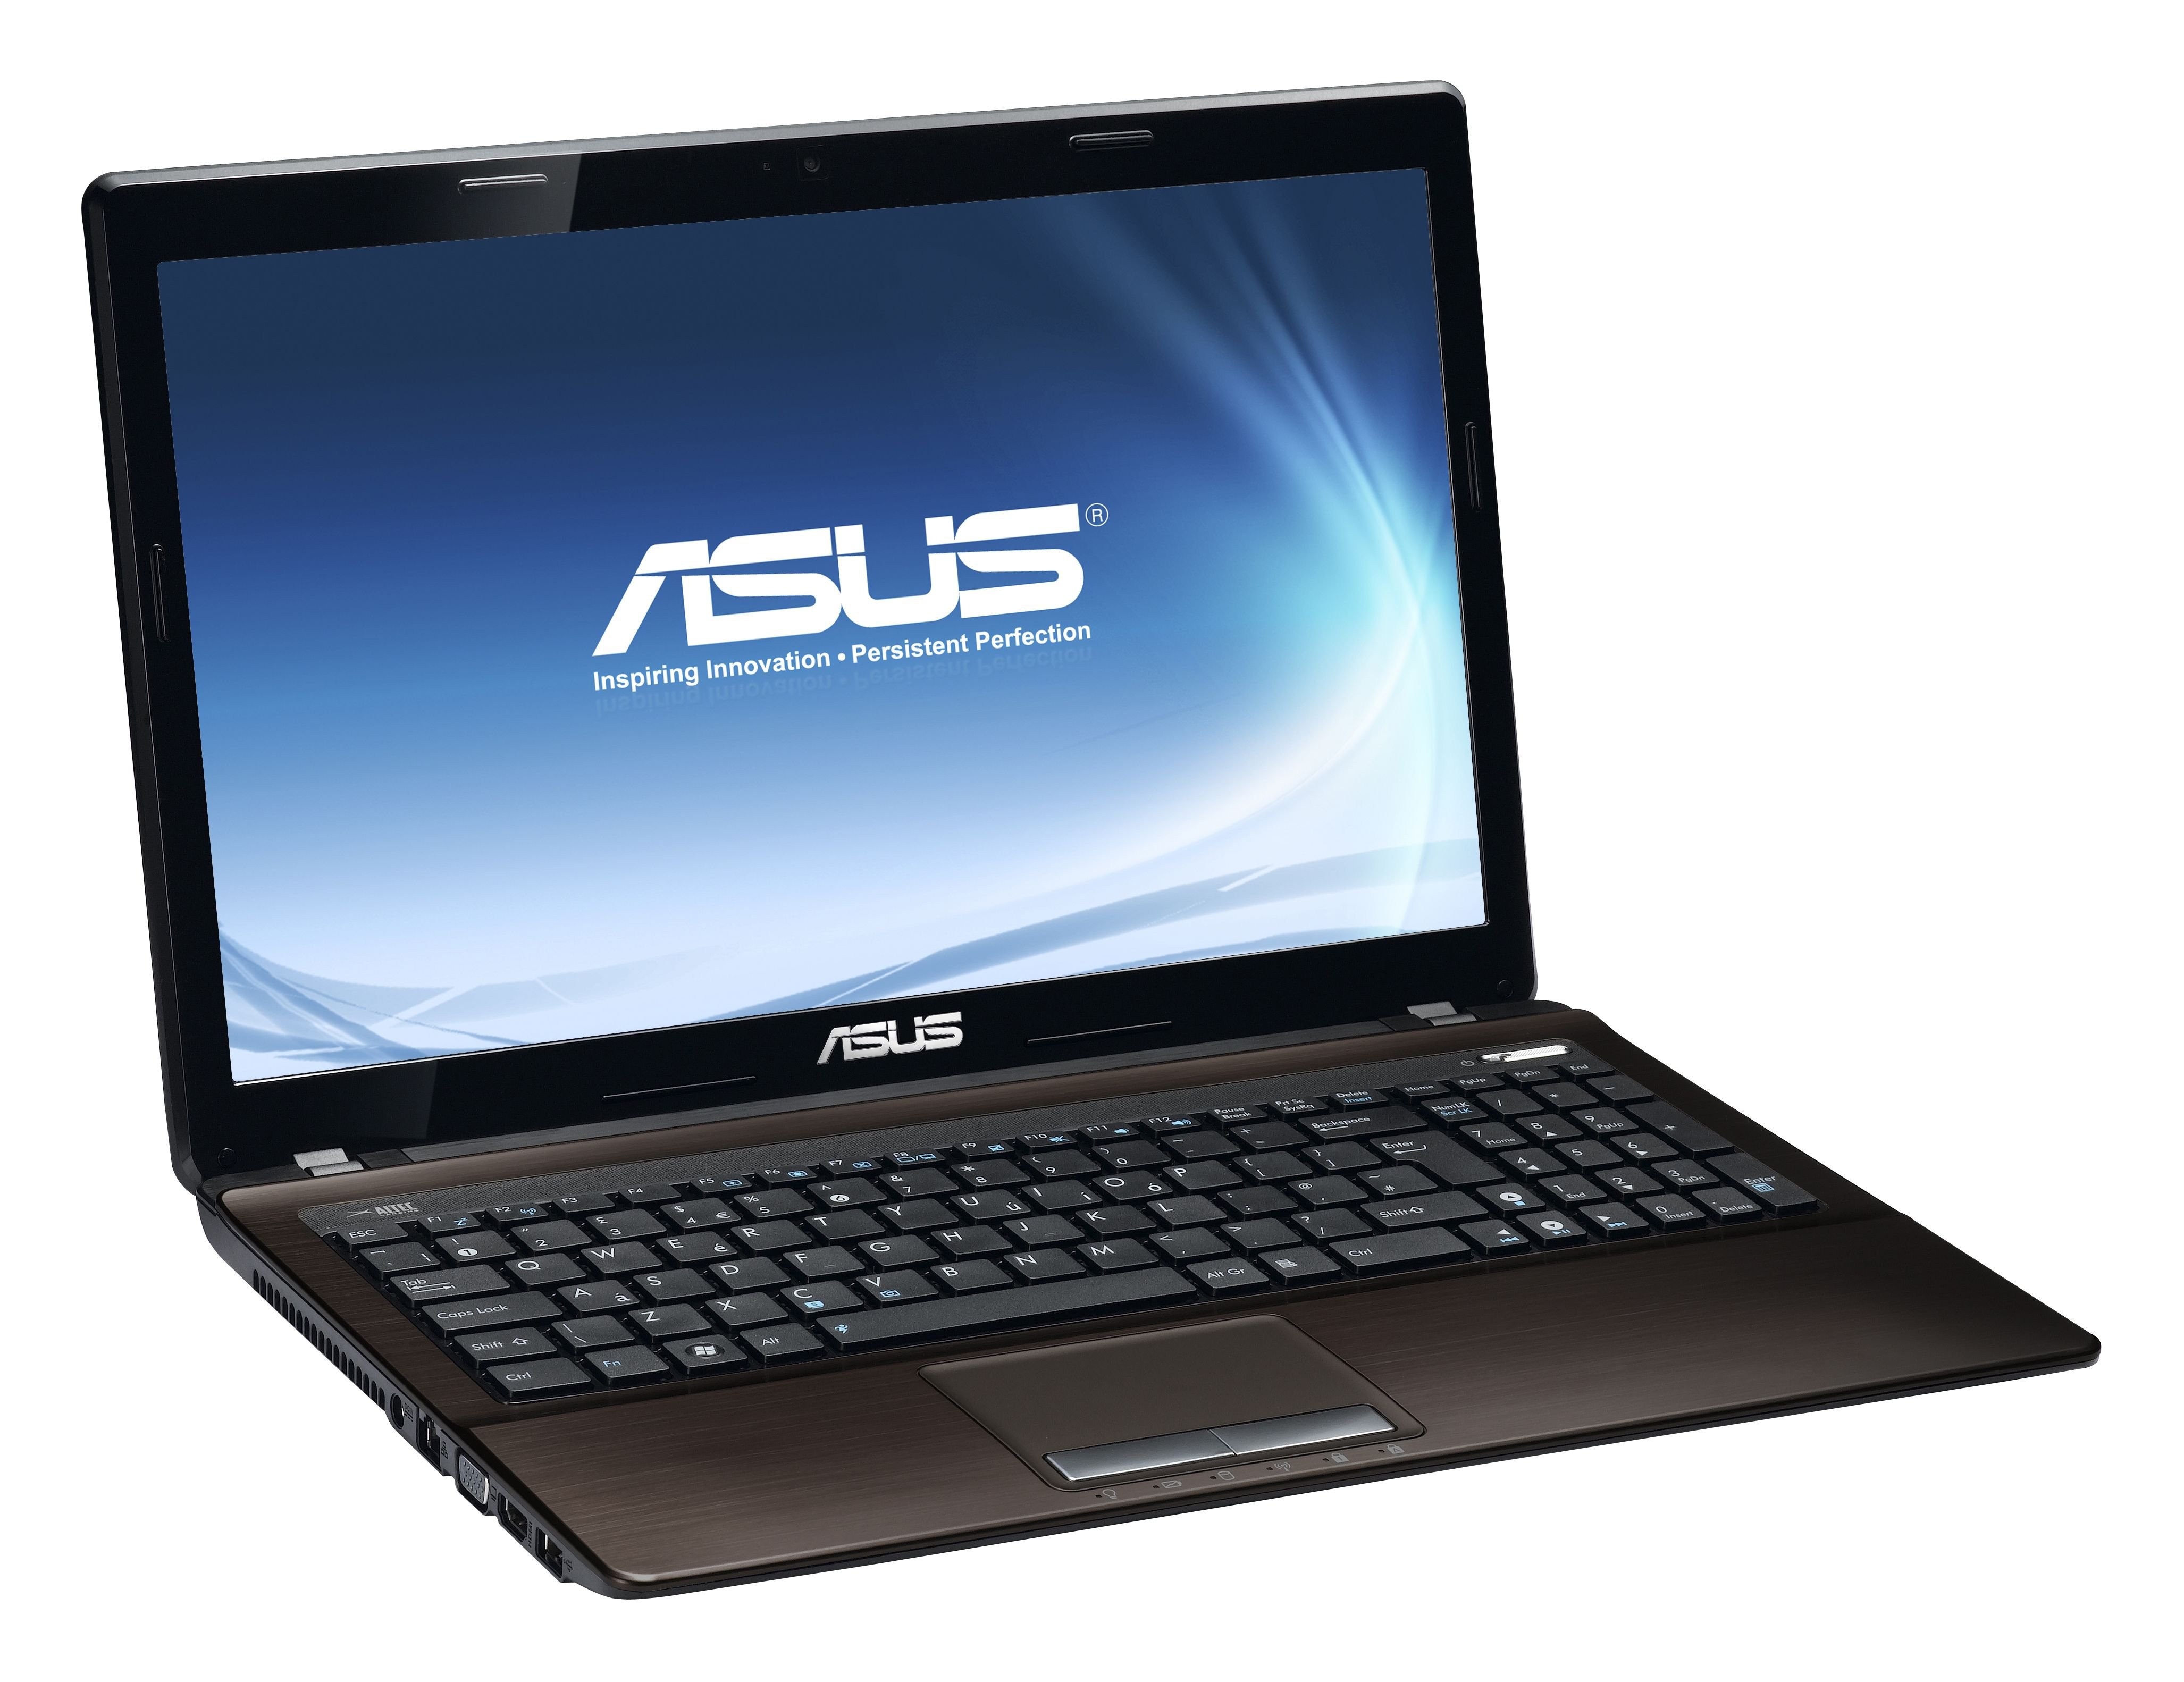 Best cheap laptop under 250